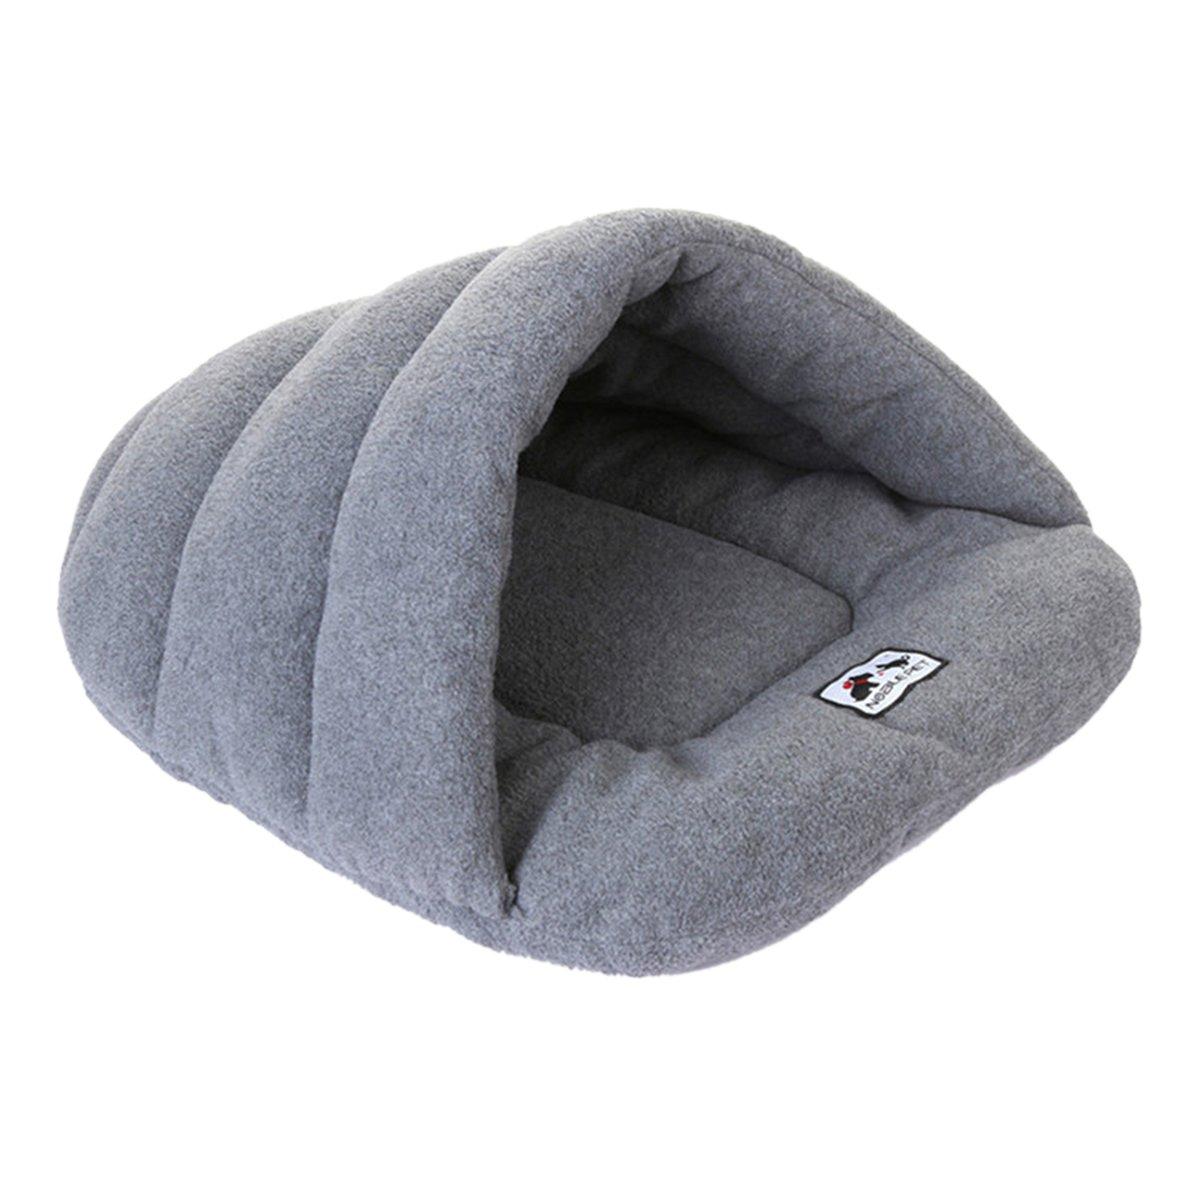 Grey L-22.8\ Grey L-22.8\ UHeng Pet Dog Cat Nest Bed Soft Warm Cave House Sleeping Mat Cushion